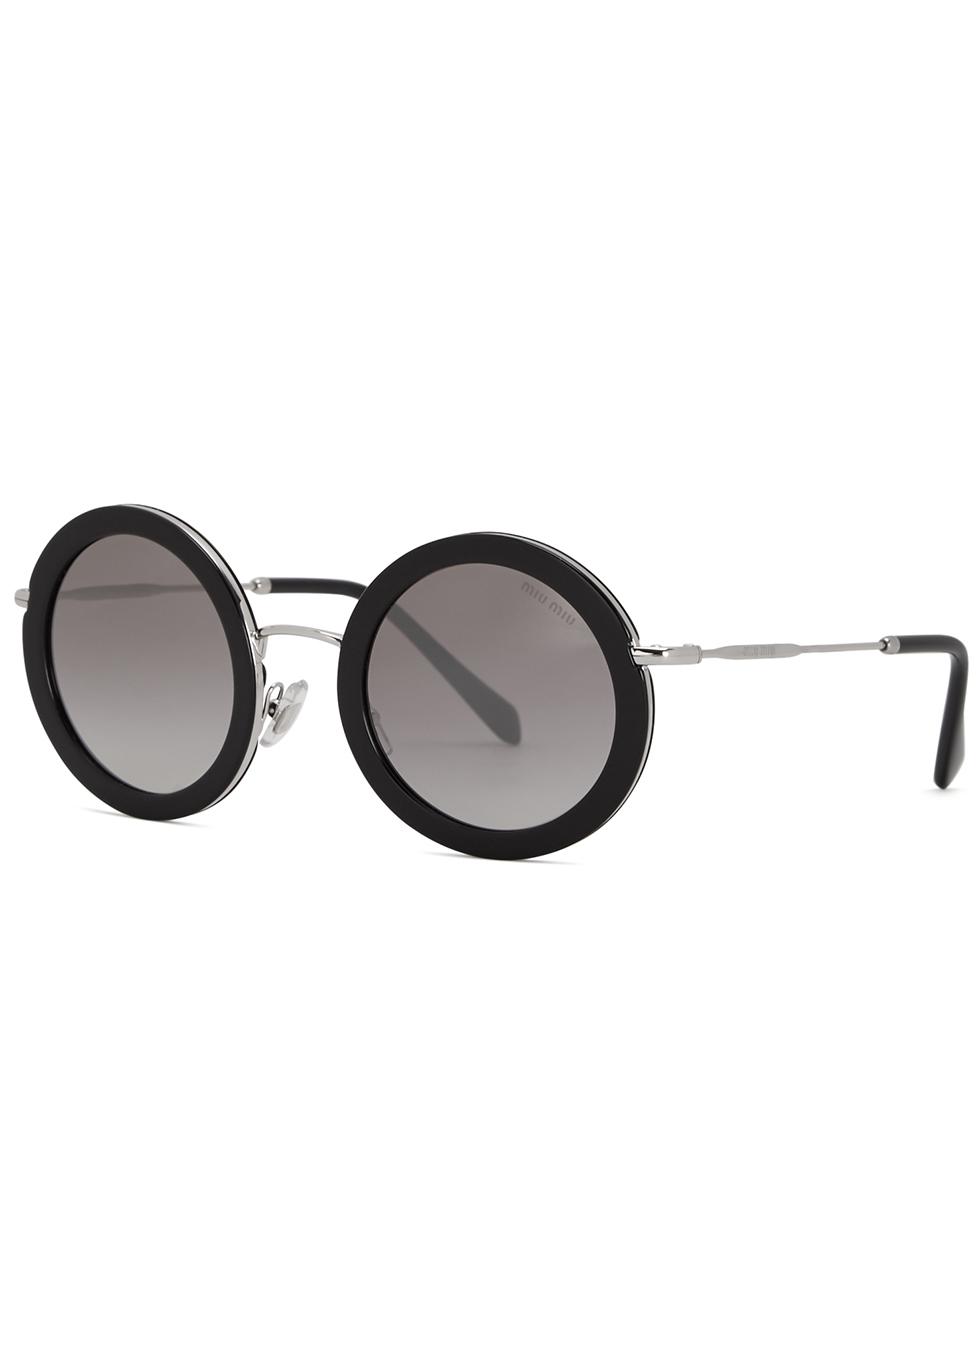 4c3dadf7dd1 Women s Designer Sunglasses and Eyewear - Harvey Nichols